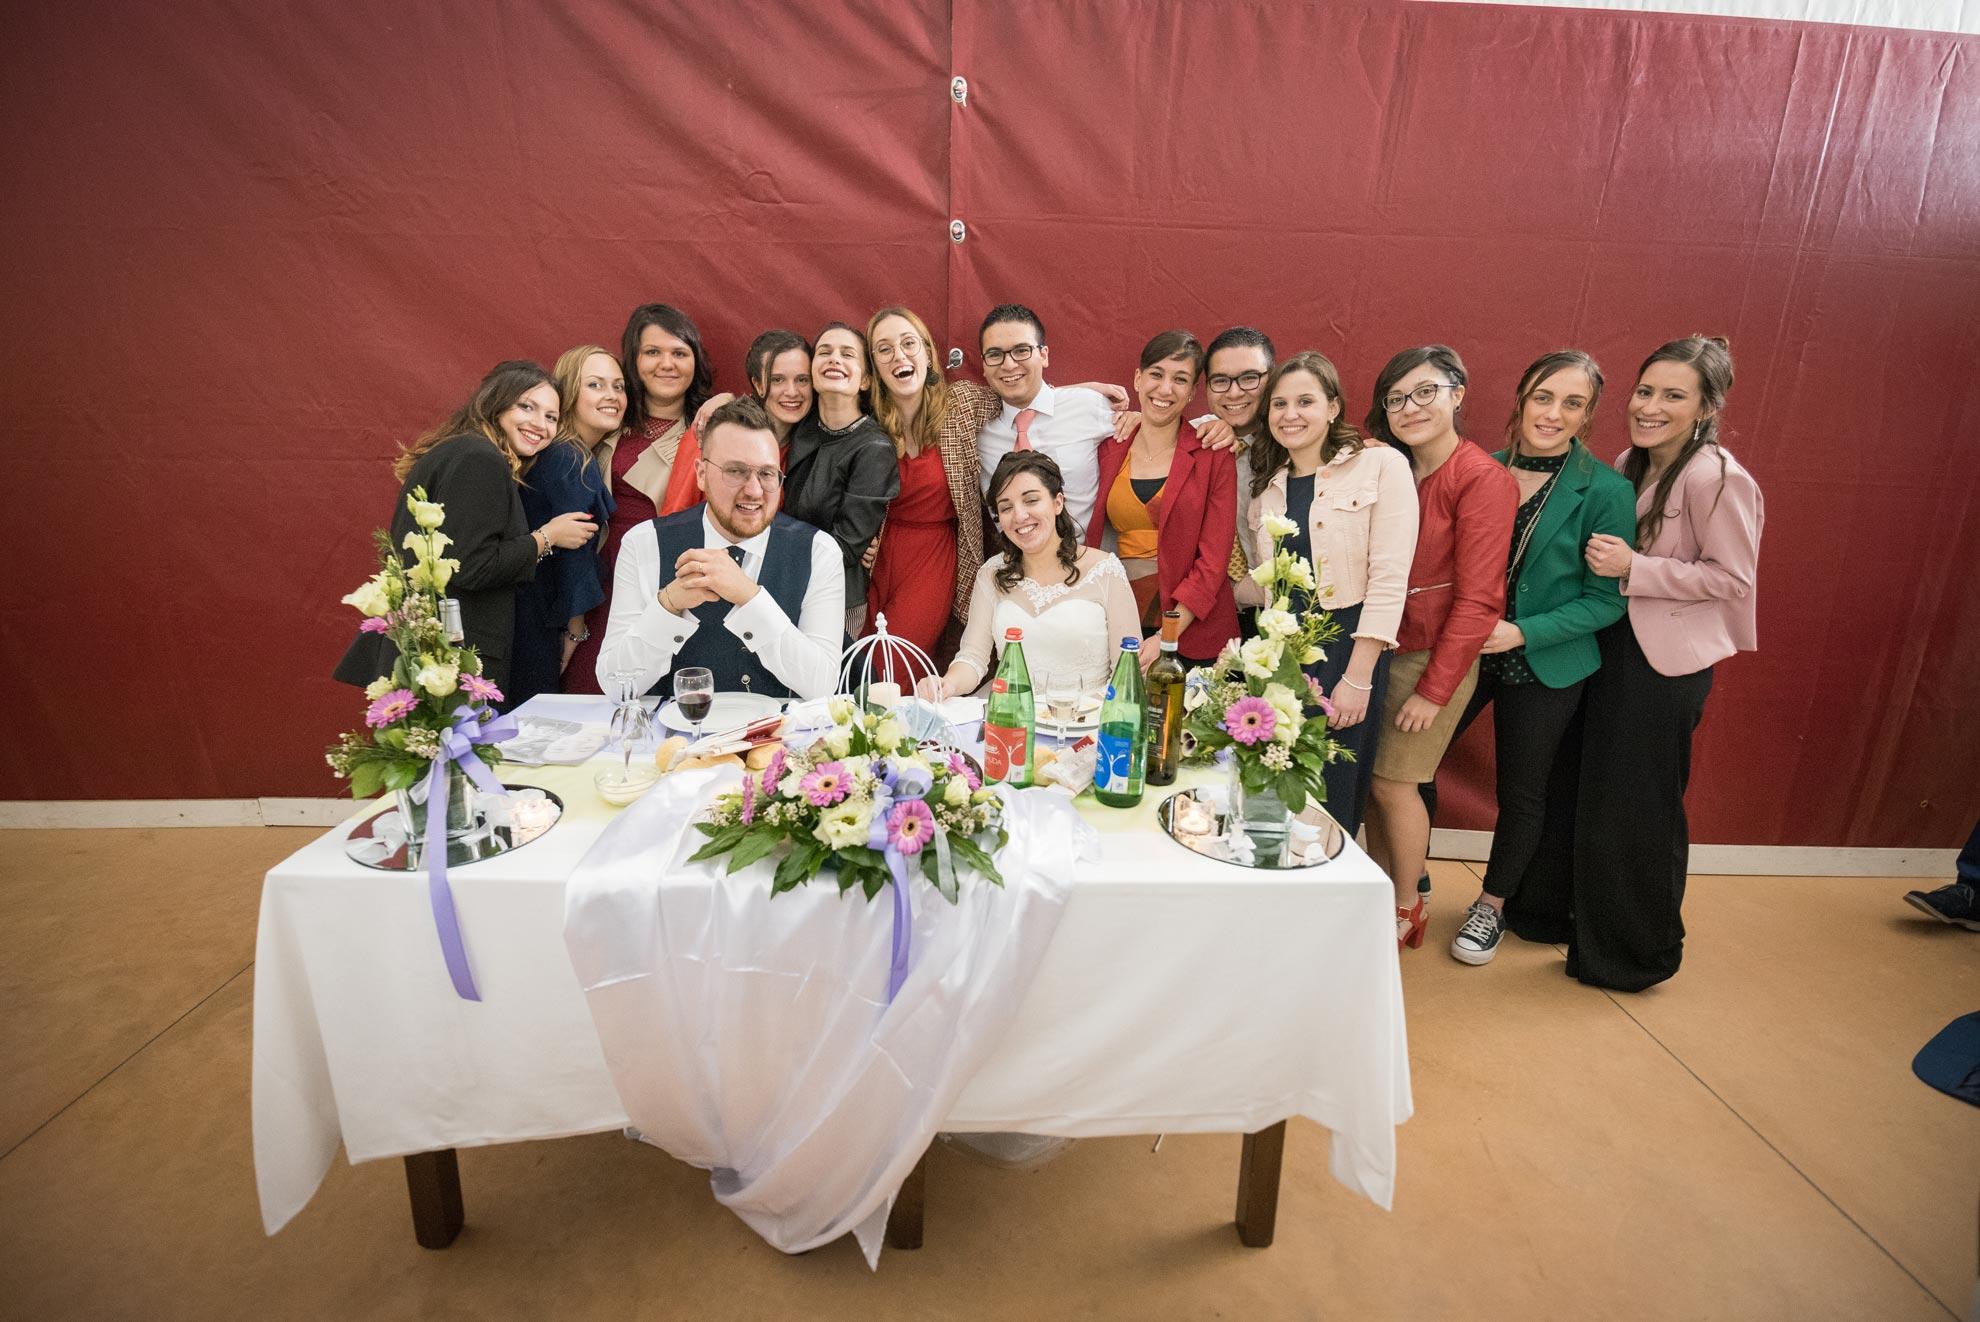 Matrimonio a Narzole Lorenza Diego - DSC 0820 - Fotografie amici matrimonio nel Roero - Fotografie amici matrimonio nel Roero